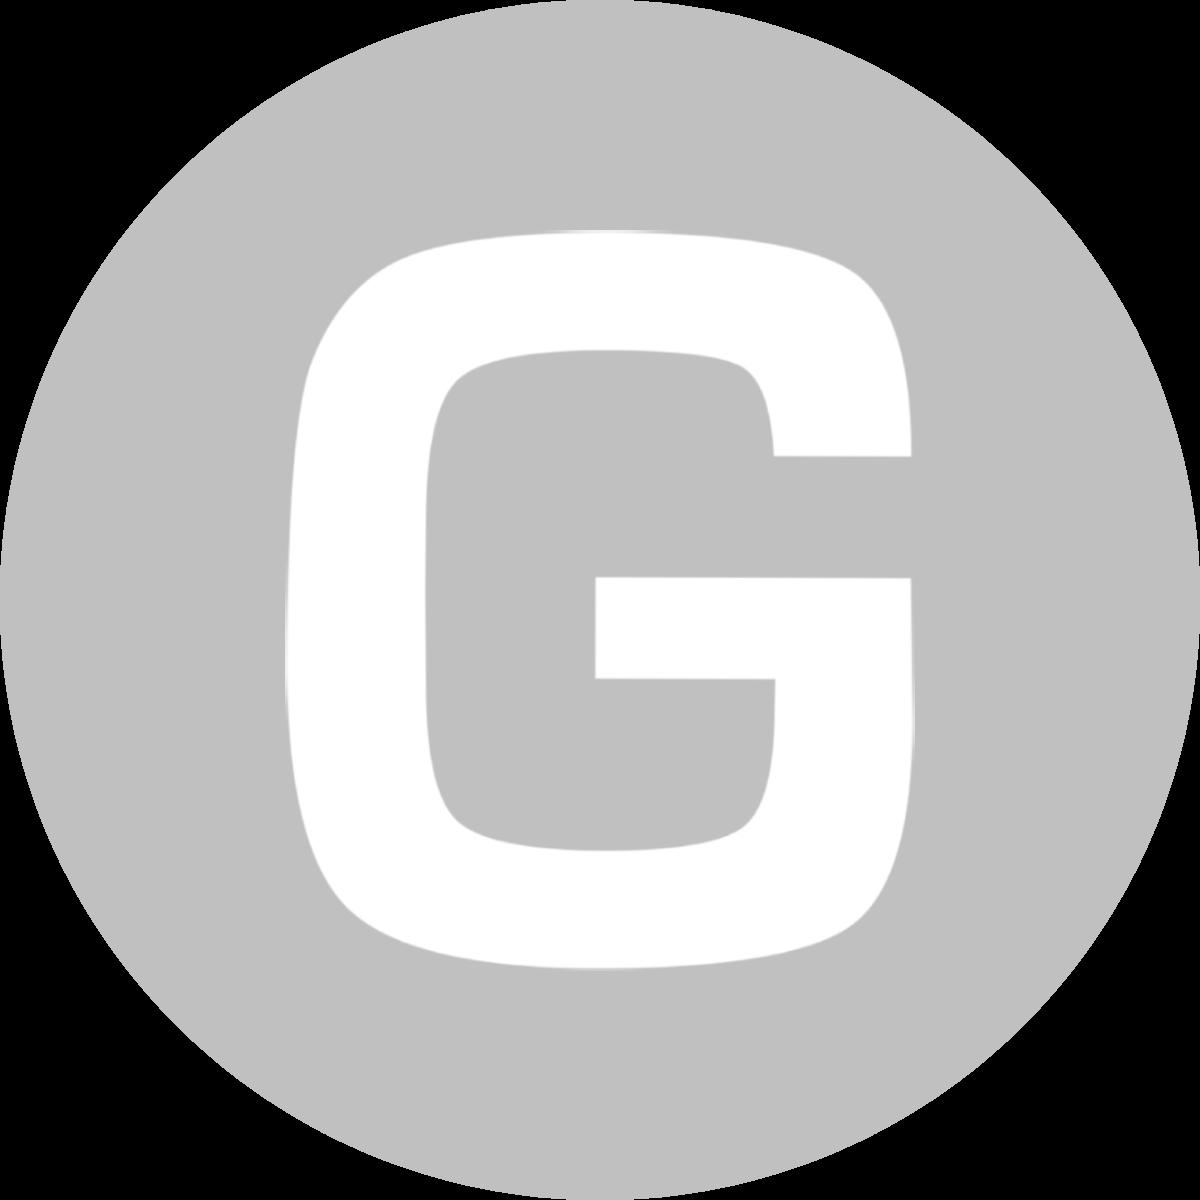 Bushnell Tour V5 SHIFT Slim Laser